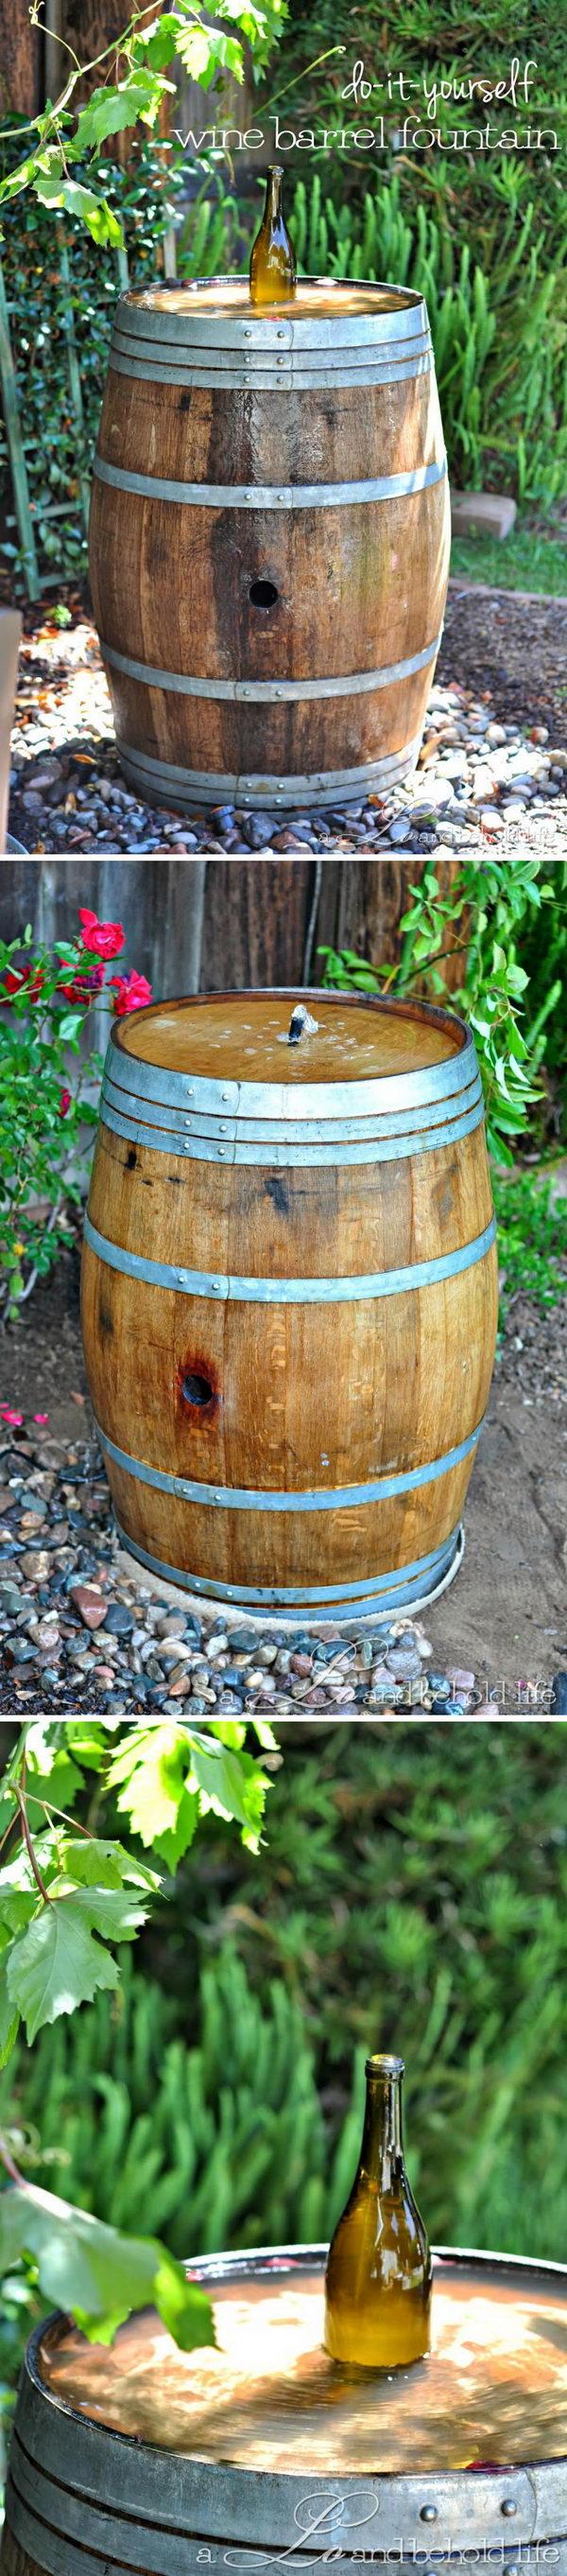 Wine Barrel Water Fountain.